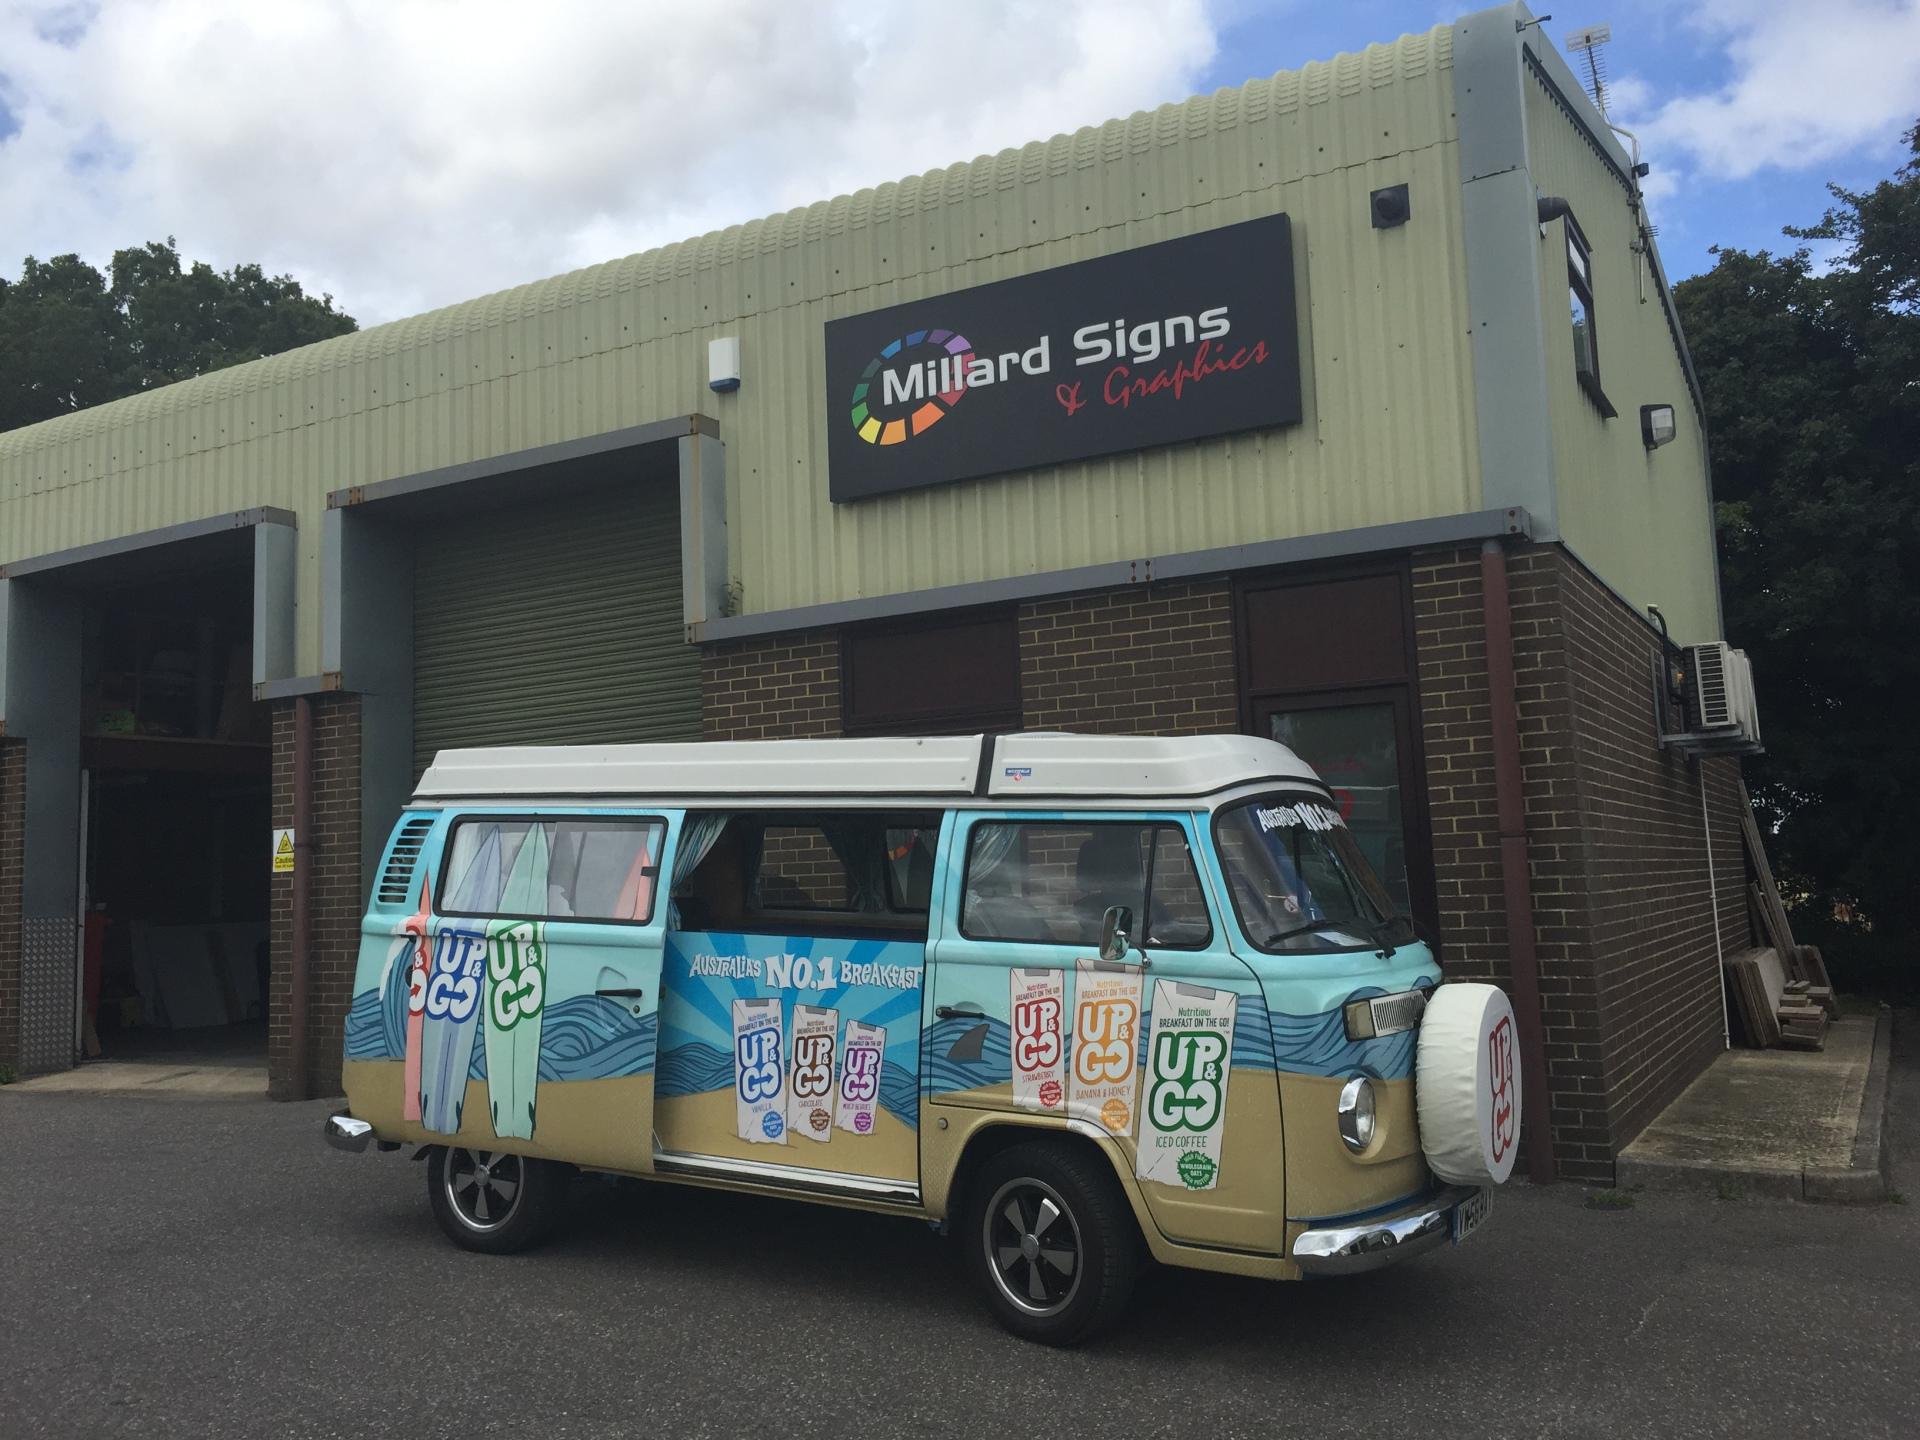 millard signs, van, van wrapping, vehicle, vehicle wrapping, red, grey, black, creative graphics, wilshire, corsham